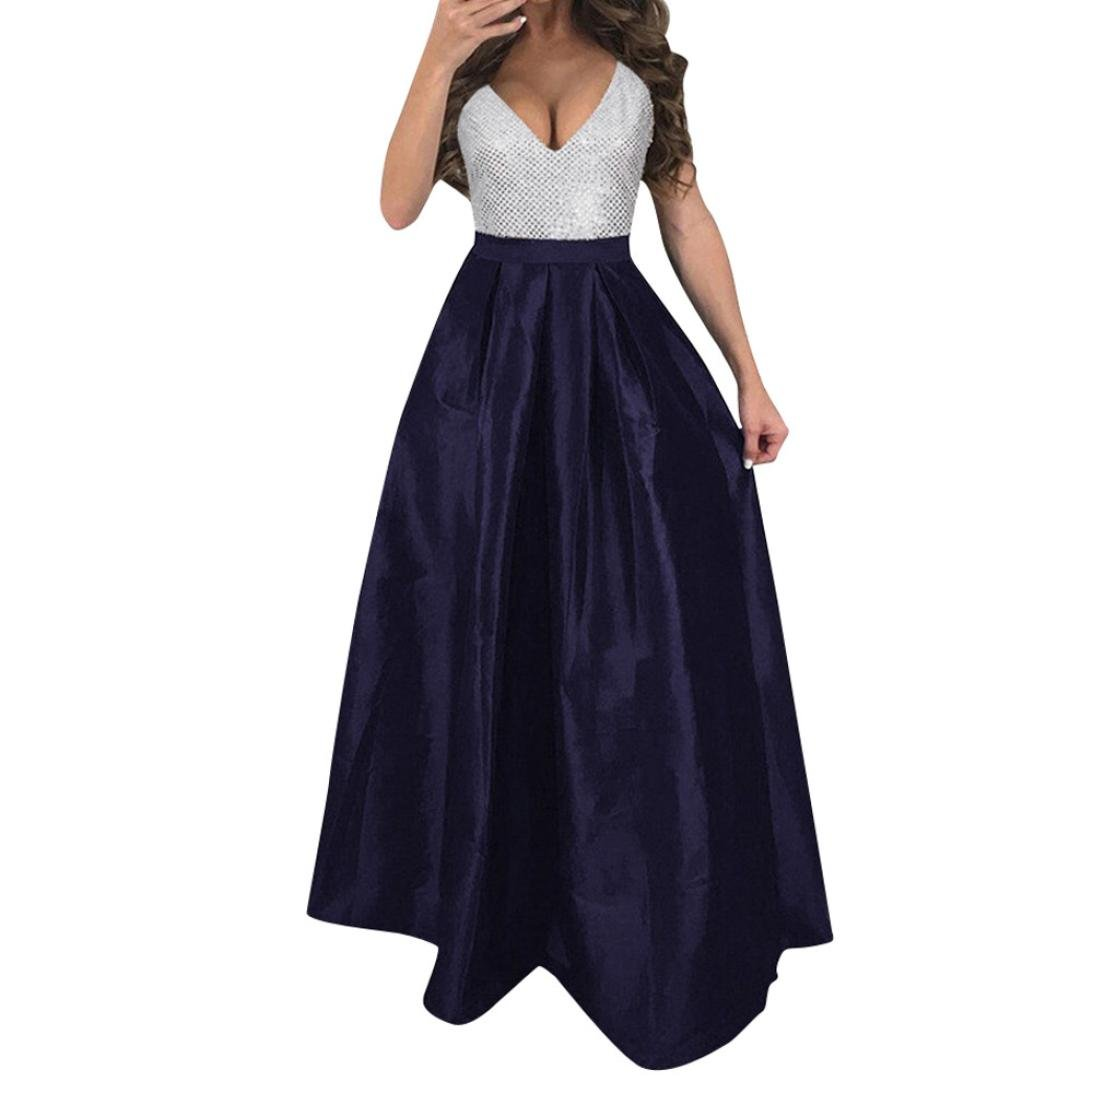 Amazon.com: Hemlock Wedding Bridesmaid Dress Long Ball Prom ...